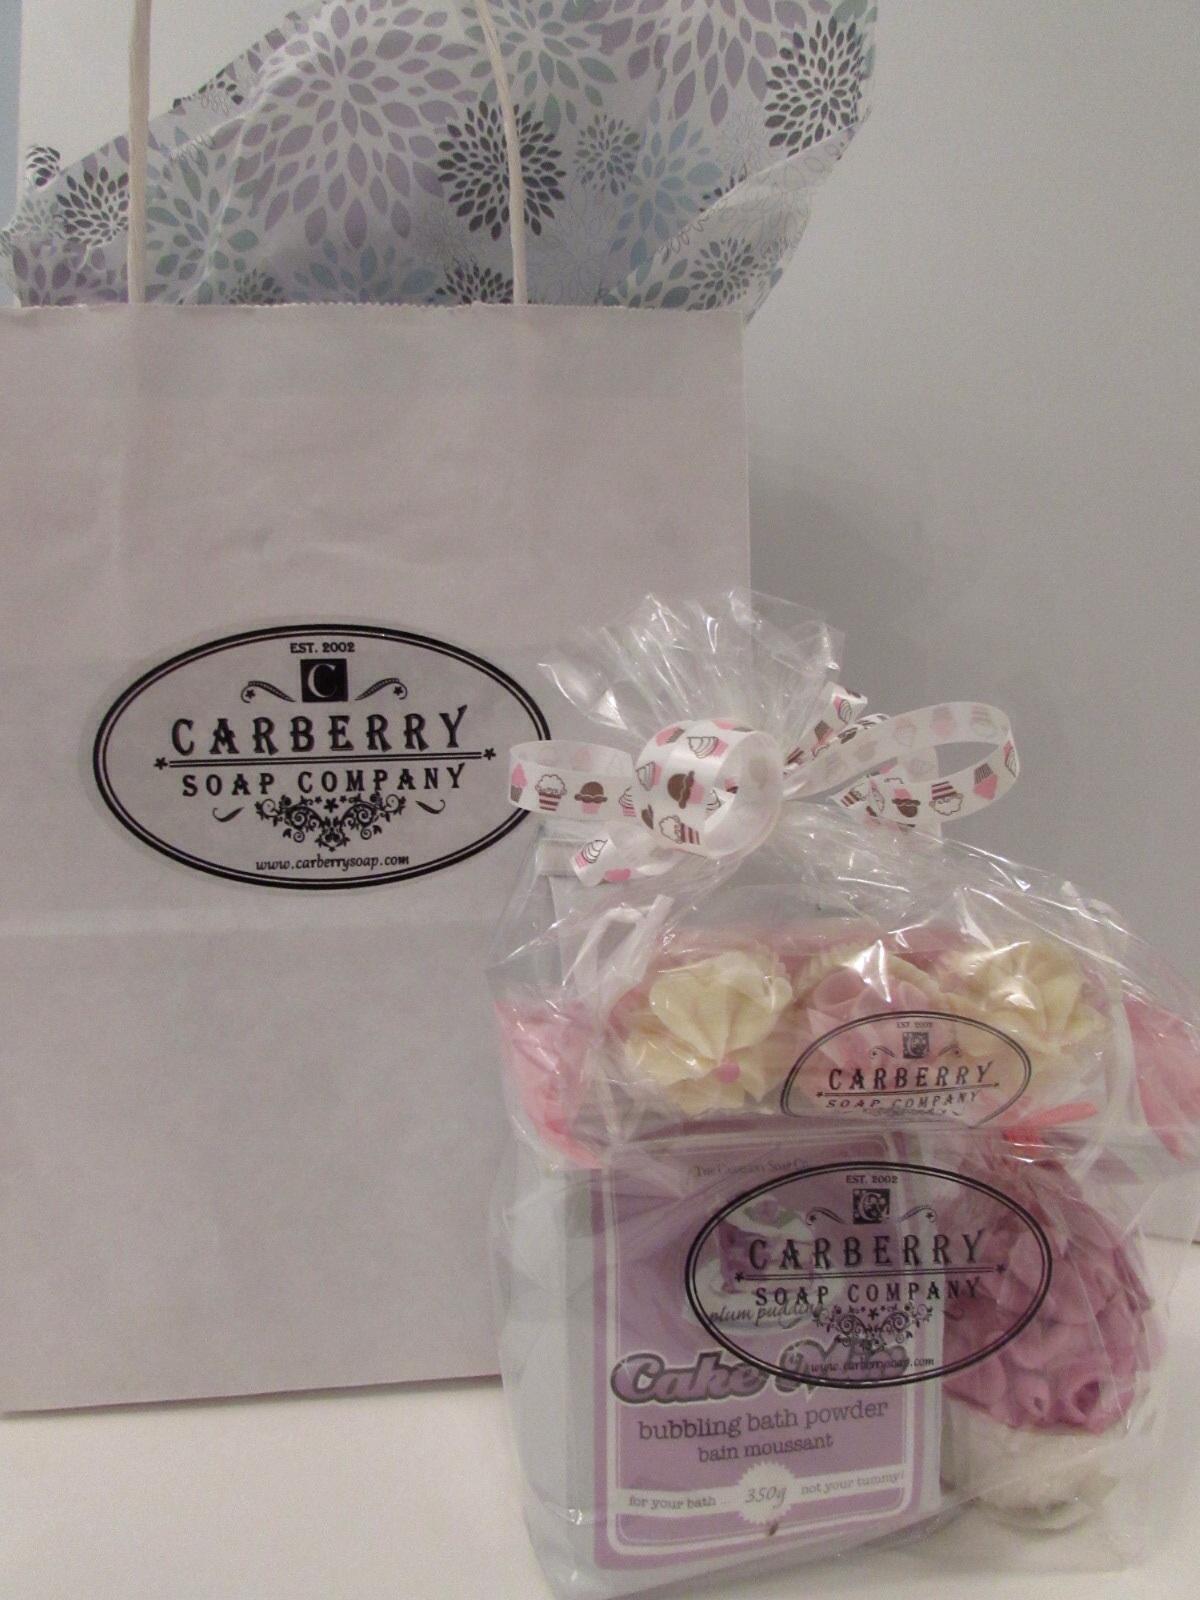 Carberry-soap-company